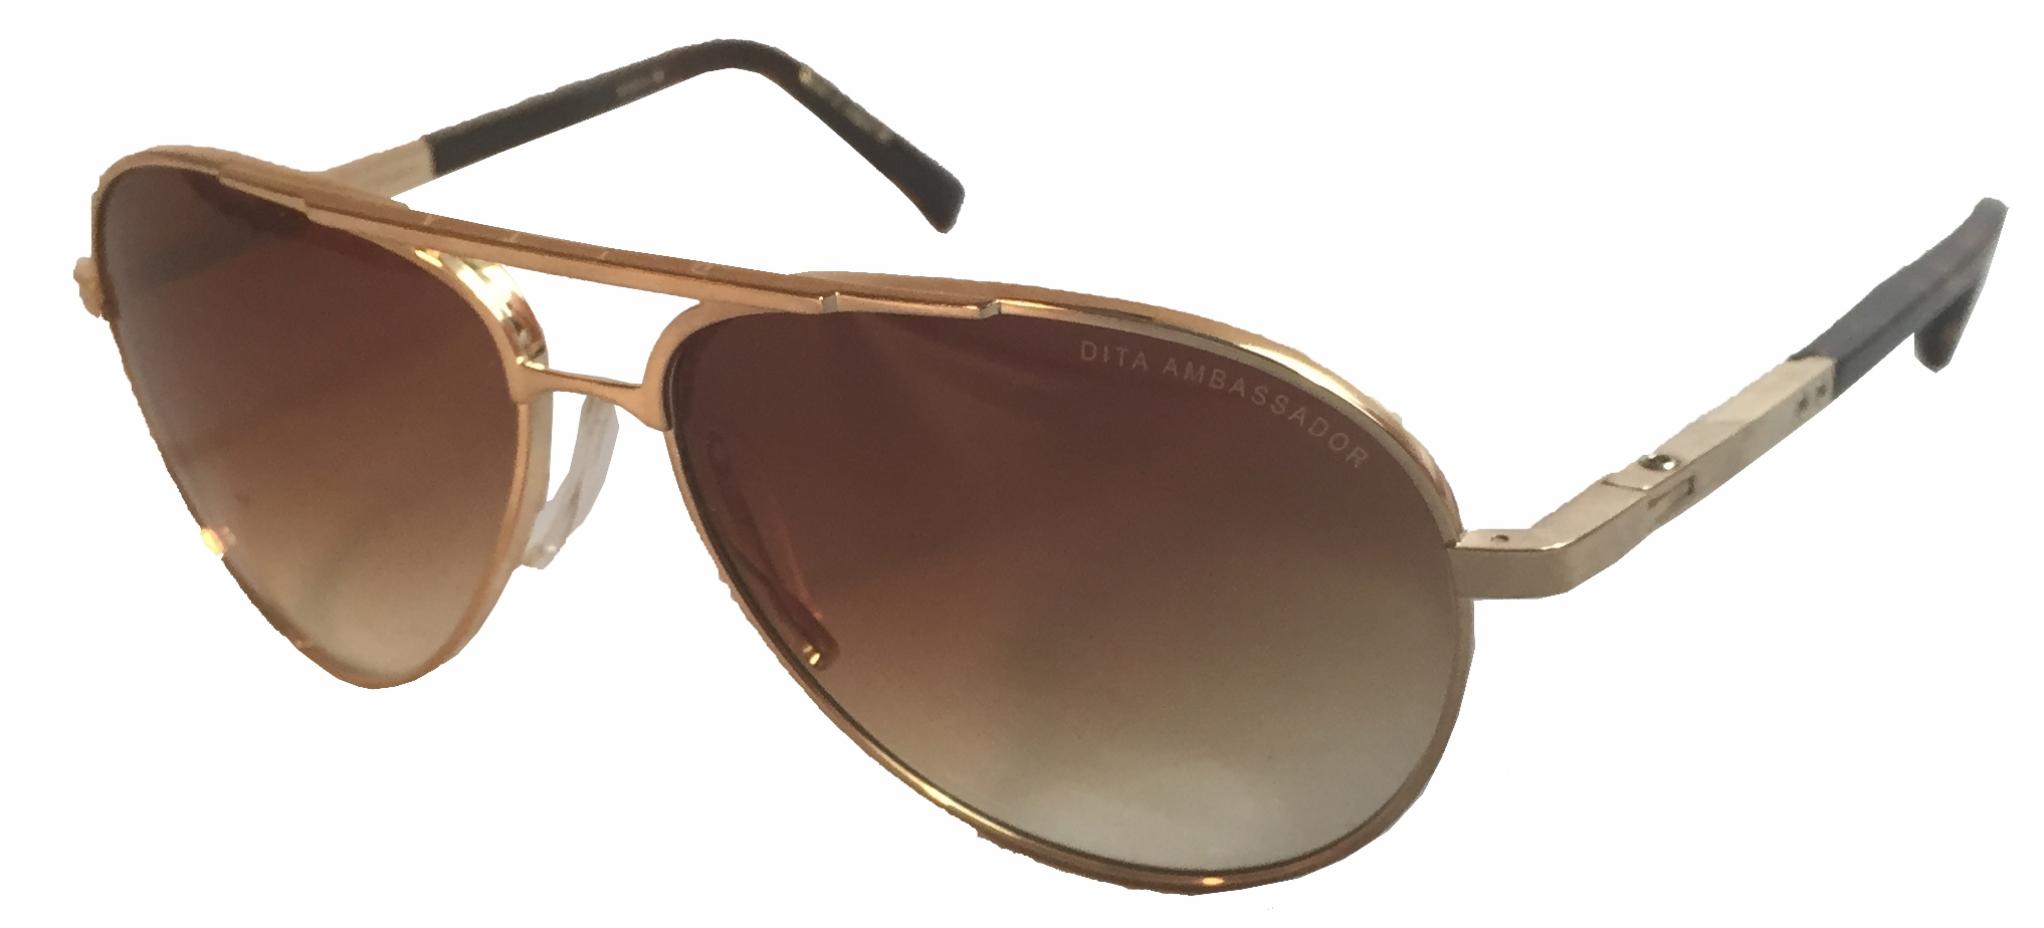 ee179792706 Clearance Dita Ambassador Sunglasses